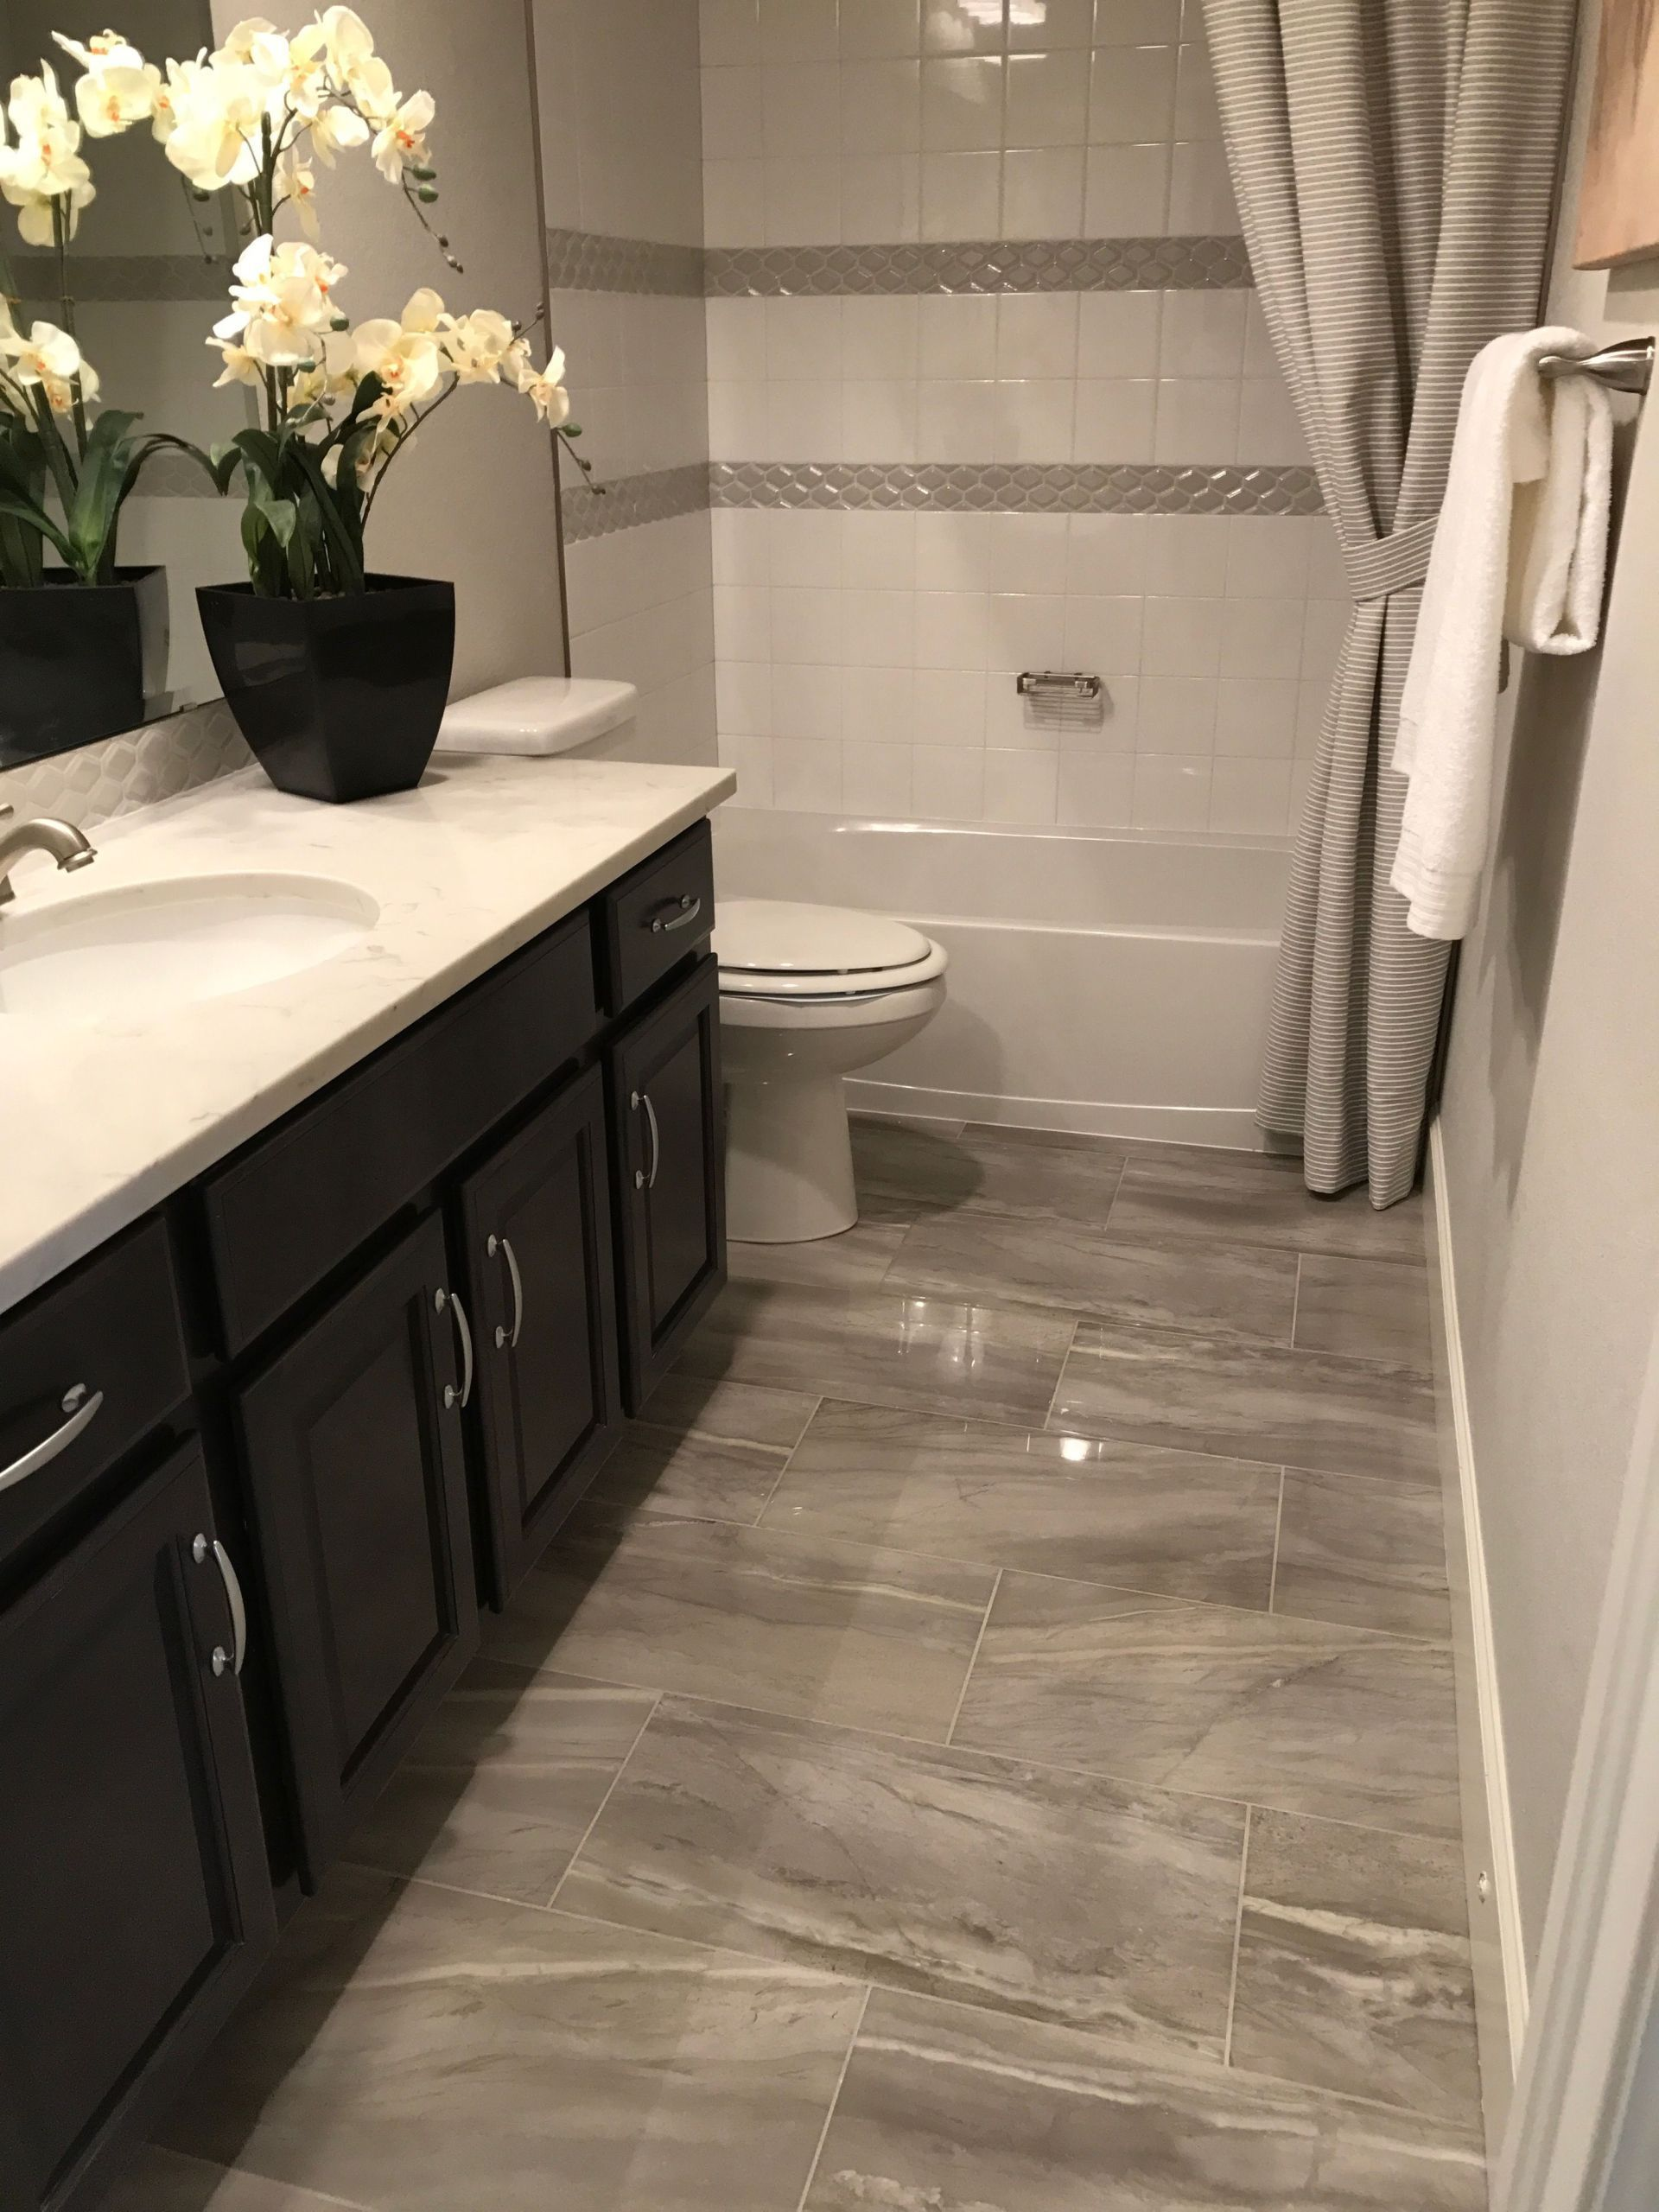 10 Small Bathroom Ideas Small Bathroom Remodel Small Master Bathroom Bathroom Remodel Master